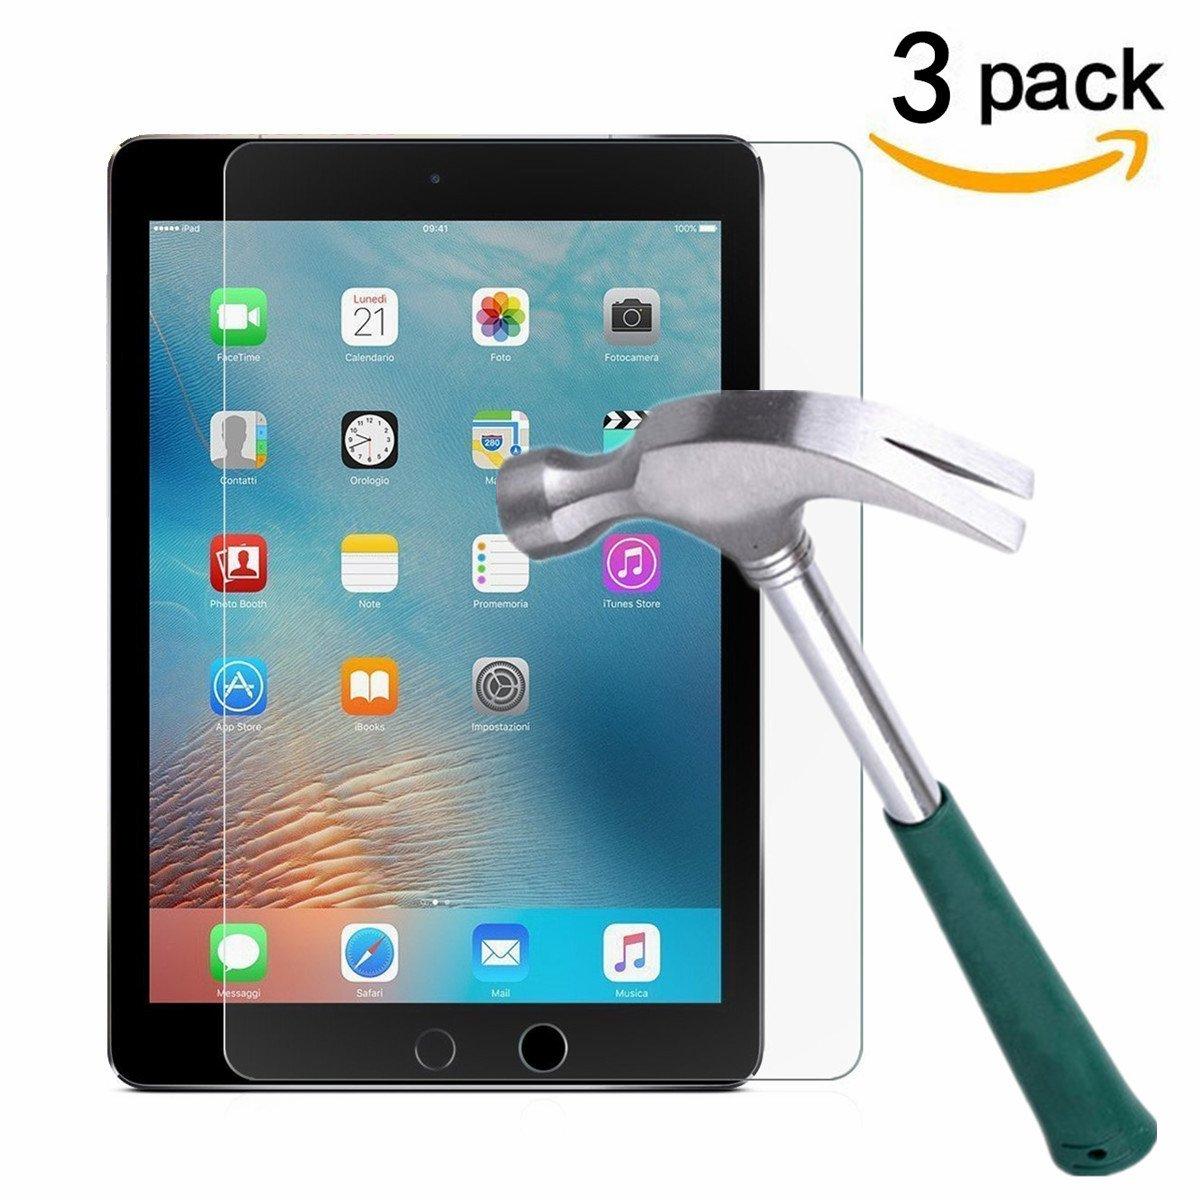 iPad 9.7' (2017)/iPad Pro 9.7/iPad Air 2/iPad Air Screen Protector [3-Pack], TANTEK Tempered Glass Screen Protector- Apple Pencil Compatible/2.5D Round Edge/Scratch Resistant